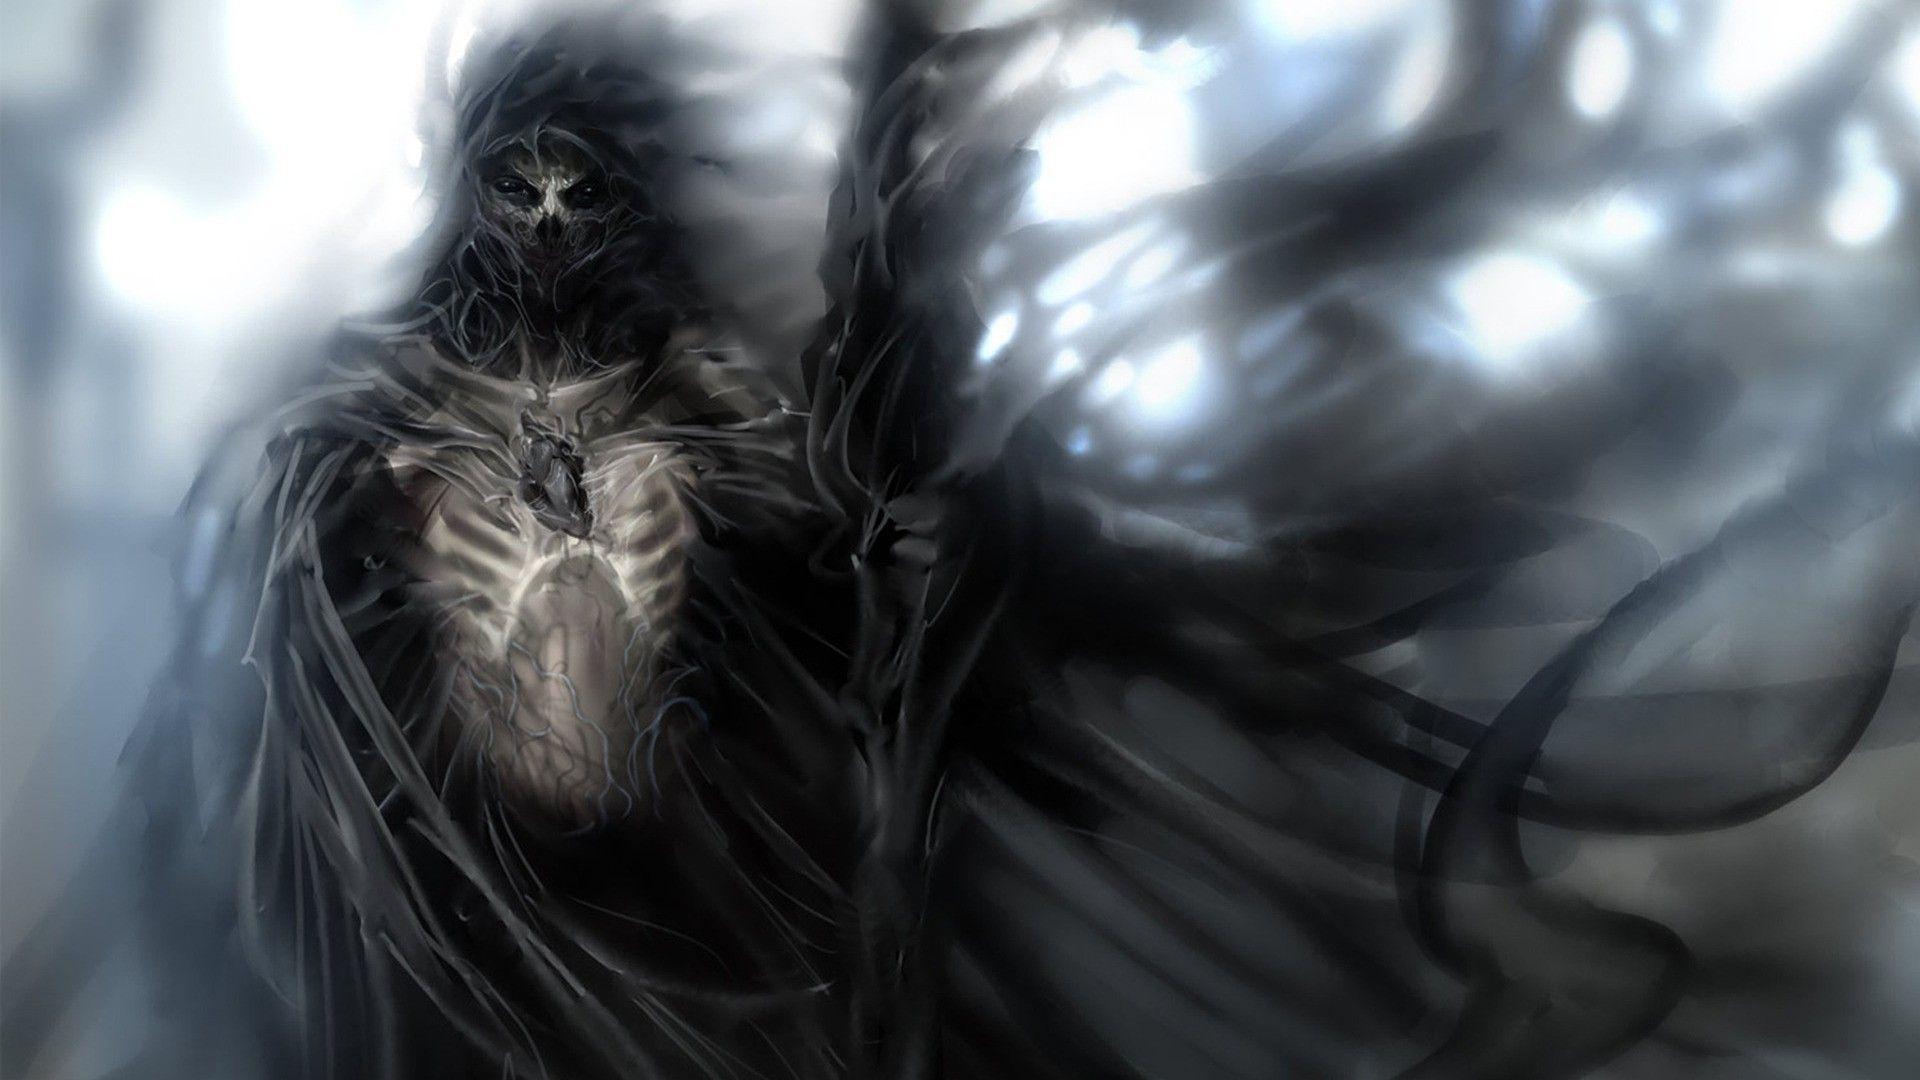 Fantasy Art Necromancers Wallpapers Hd Desktop And: Necromancer Wallpapers